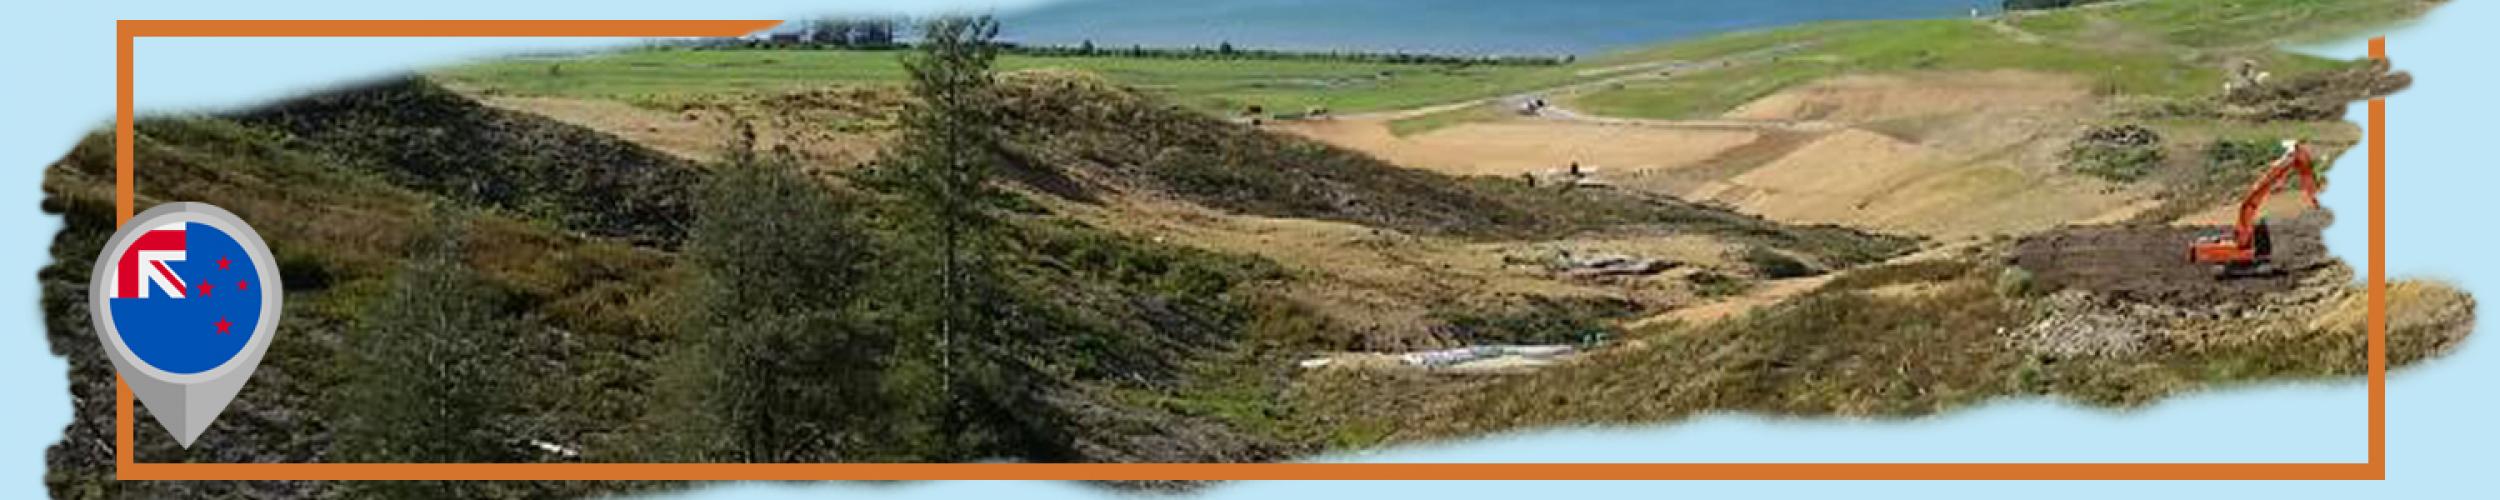 Evaluation of Alnus subcordata reforestation trial, Weiti Bay, Auckland, New Zealand